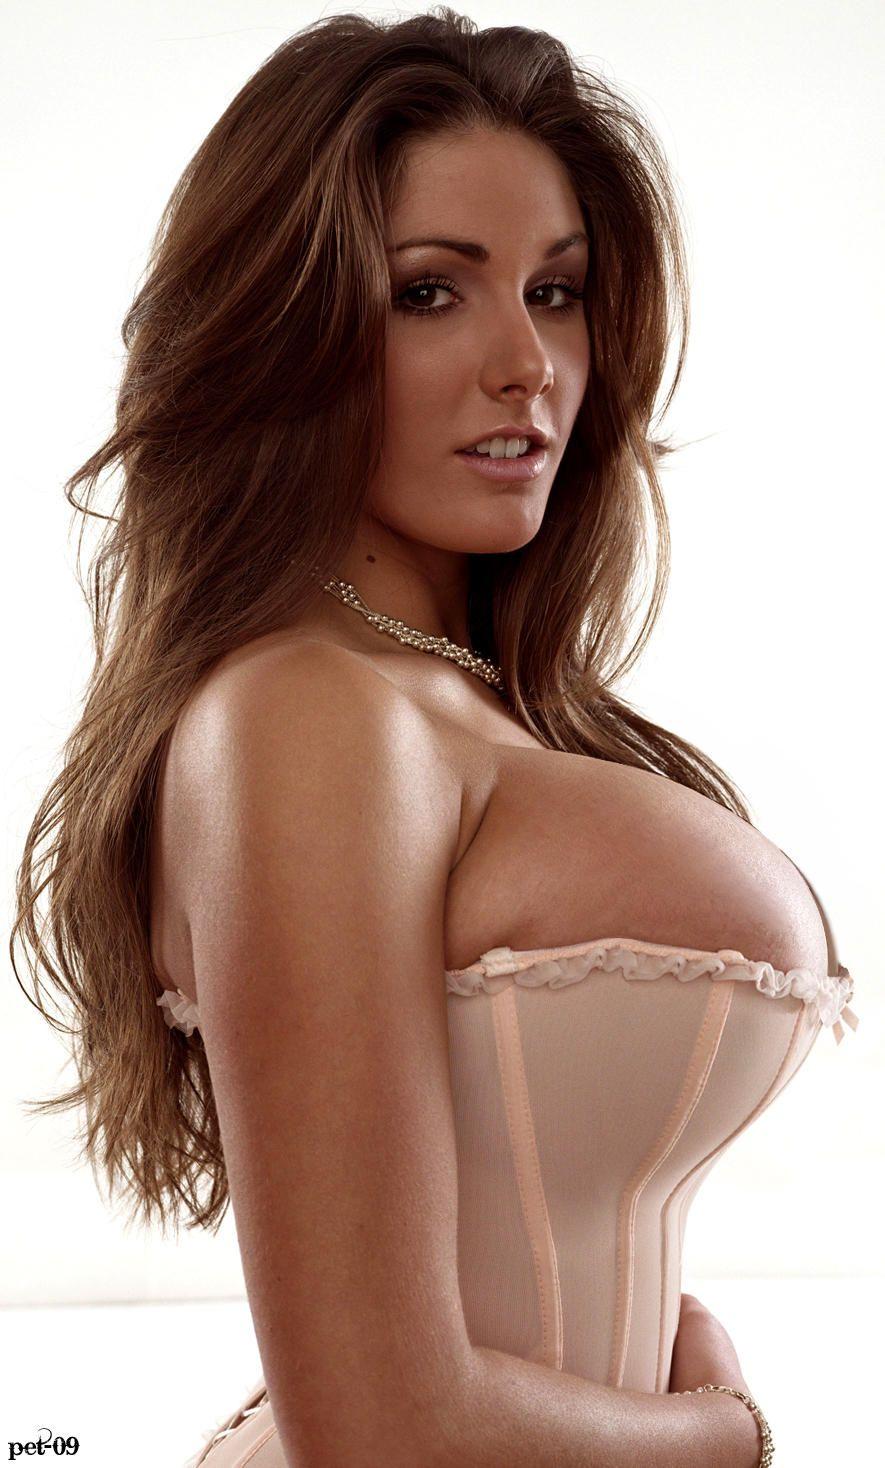 Sideboobs Constanza Mengotti nudes (52 photo), Tits, Fappening, Twitter, panties 2020